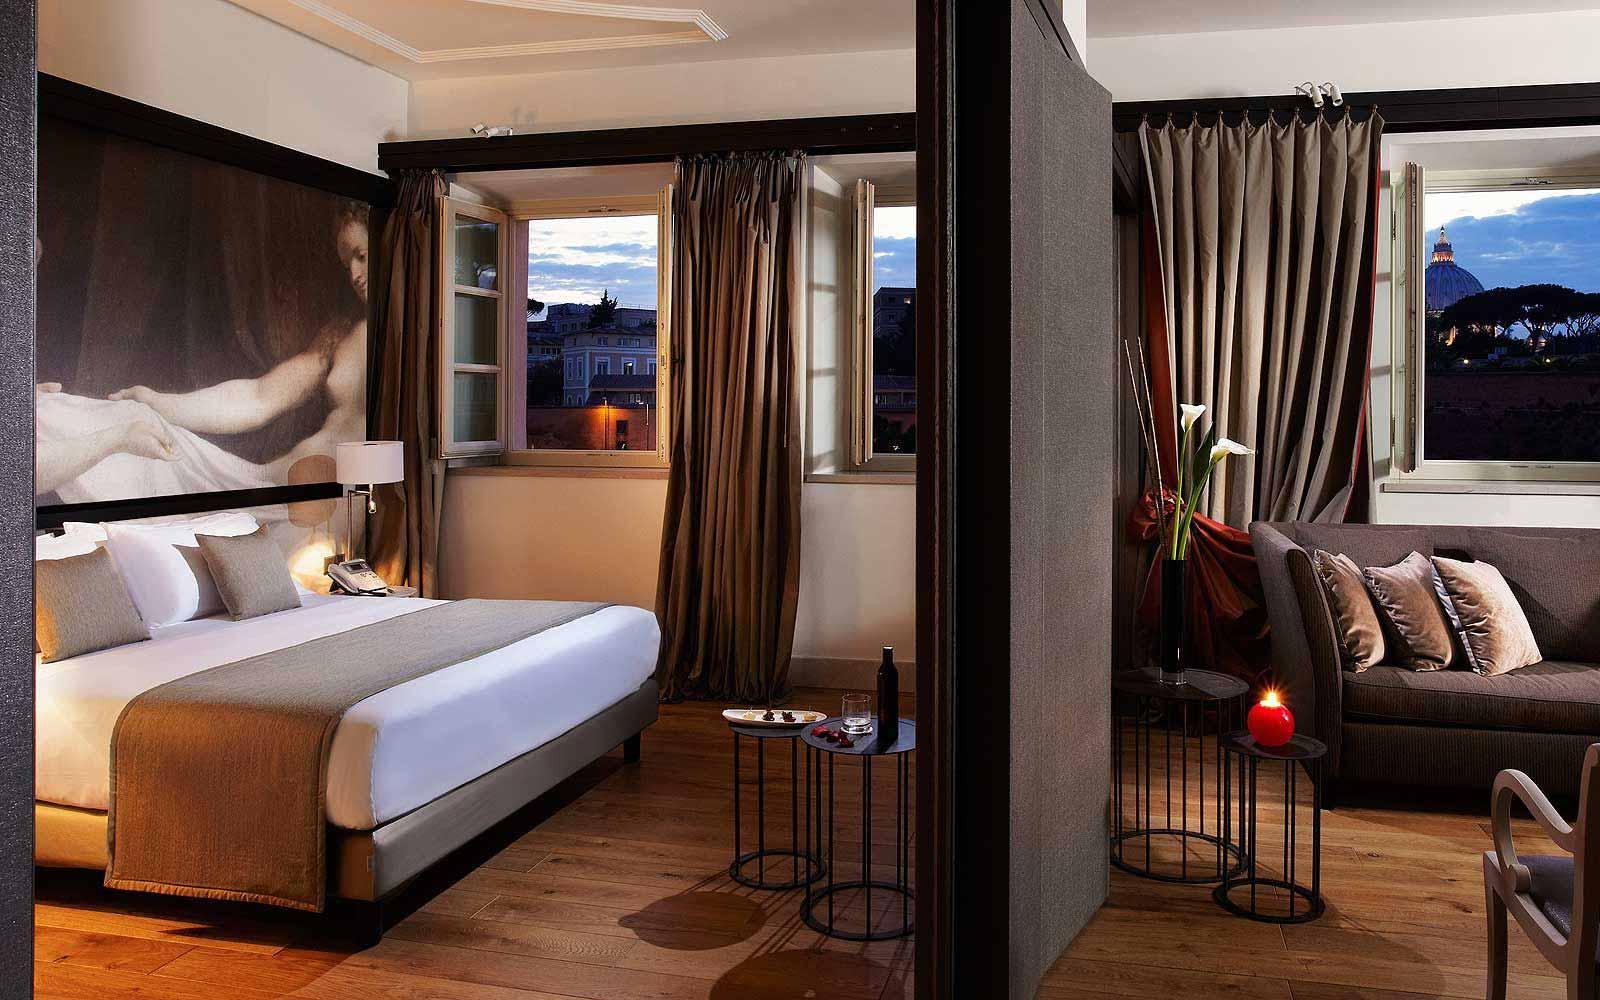 The eternal city suite at Gran Melia' Rome